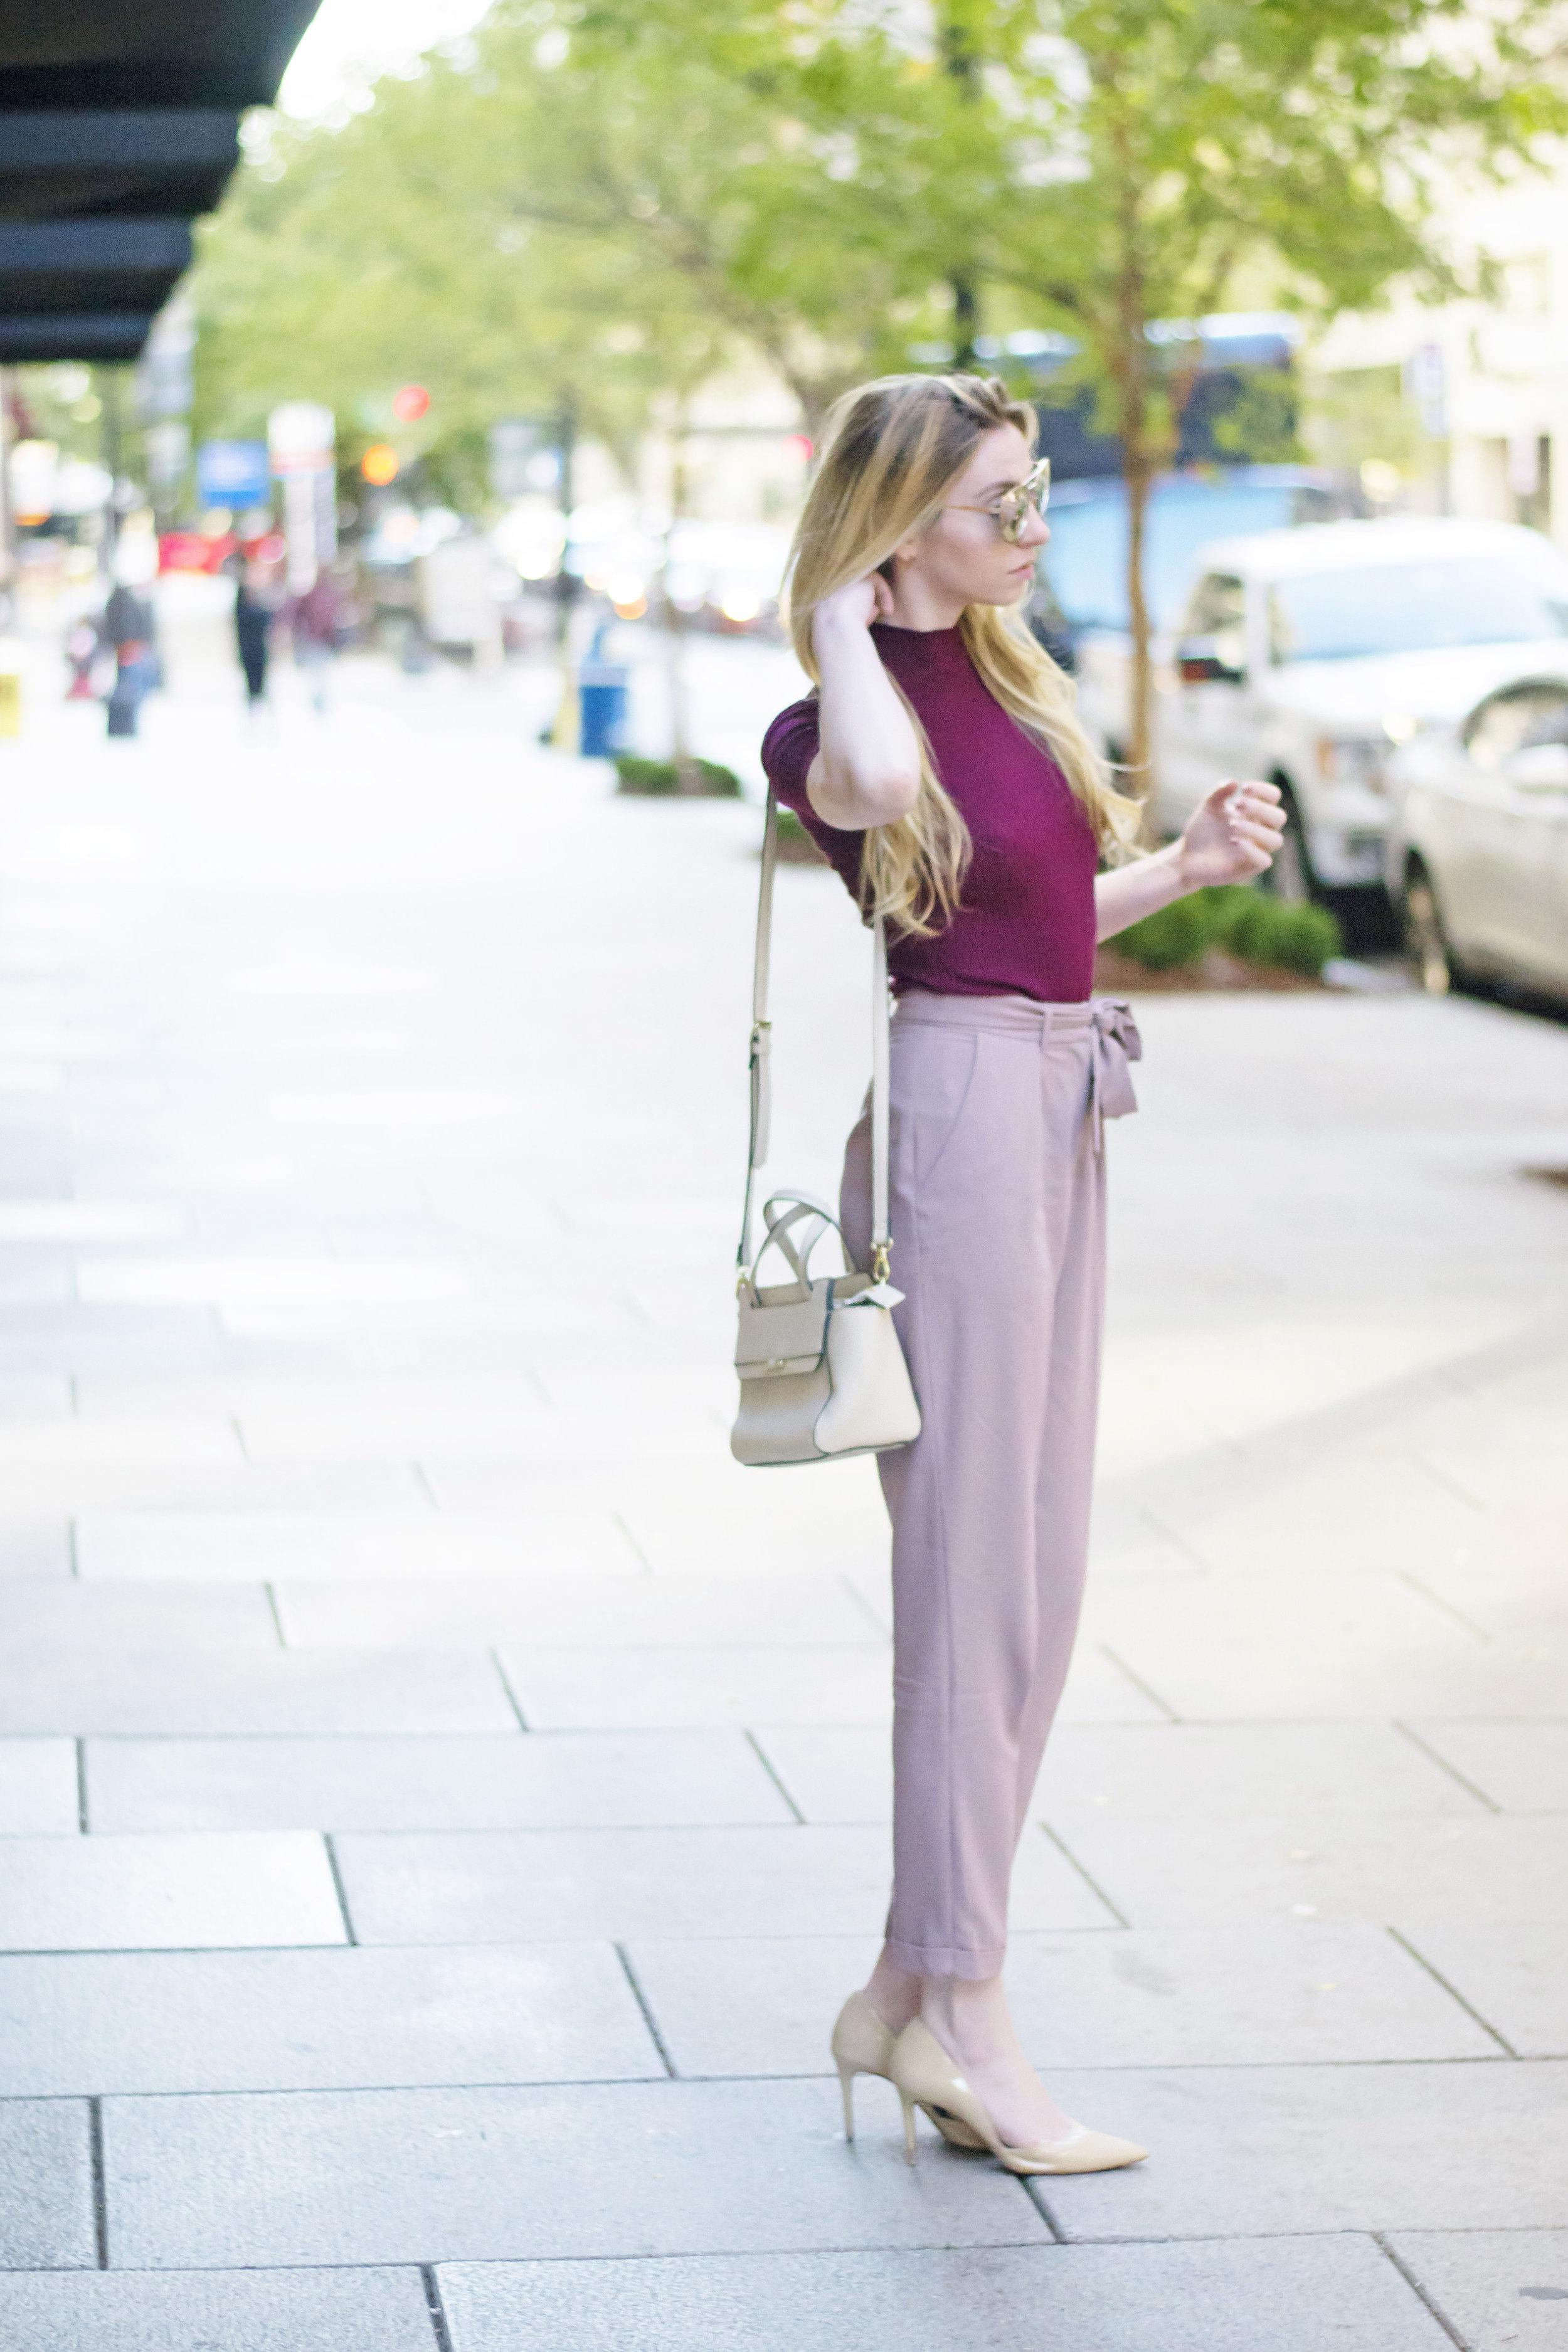 ASOS Fall Outfit Inspiration